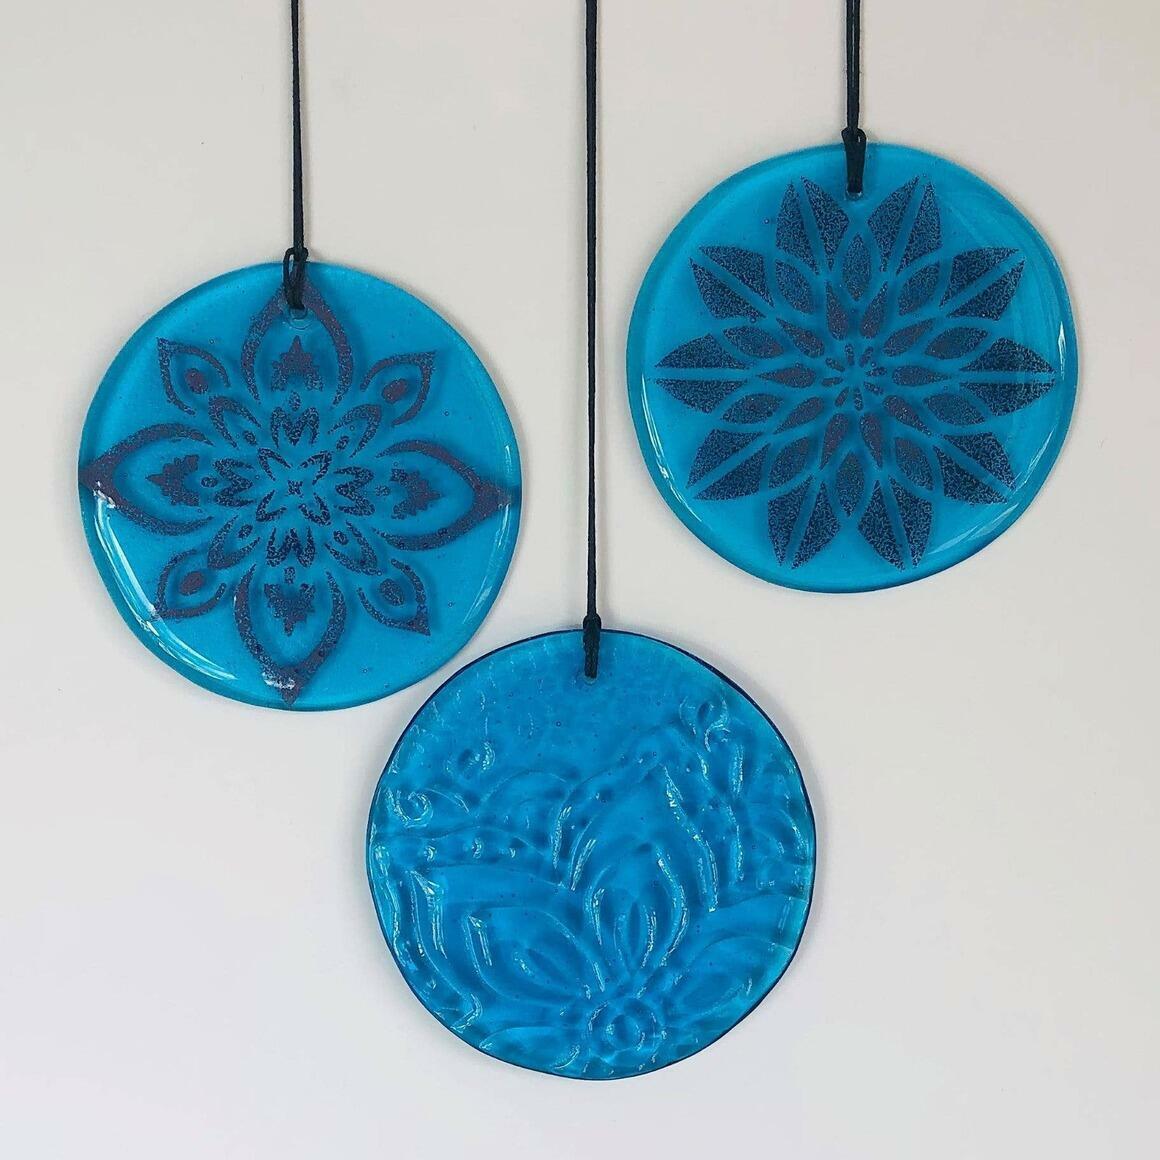 Glass Mandala Window Ornament Suncatcher - Ocean Blue | Trada Marketplace